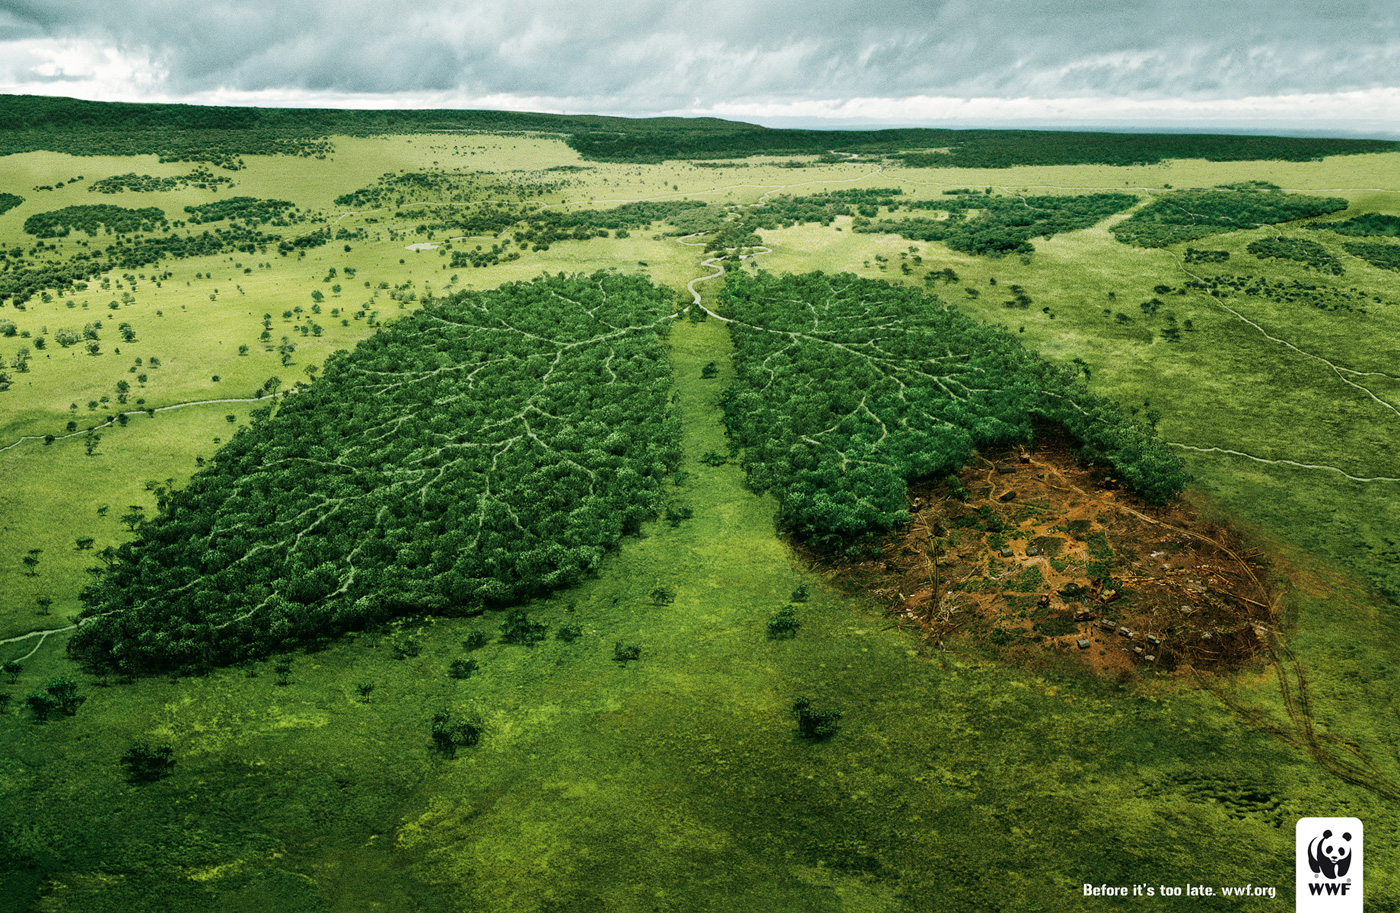 visual_storytelling_WWF